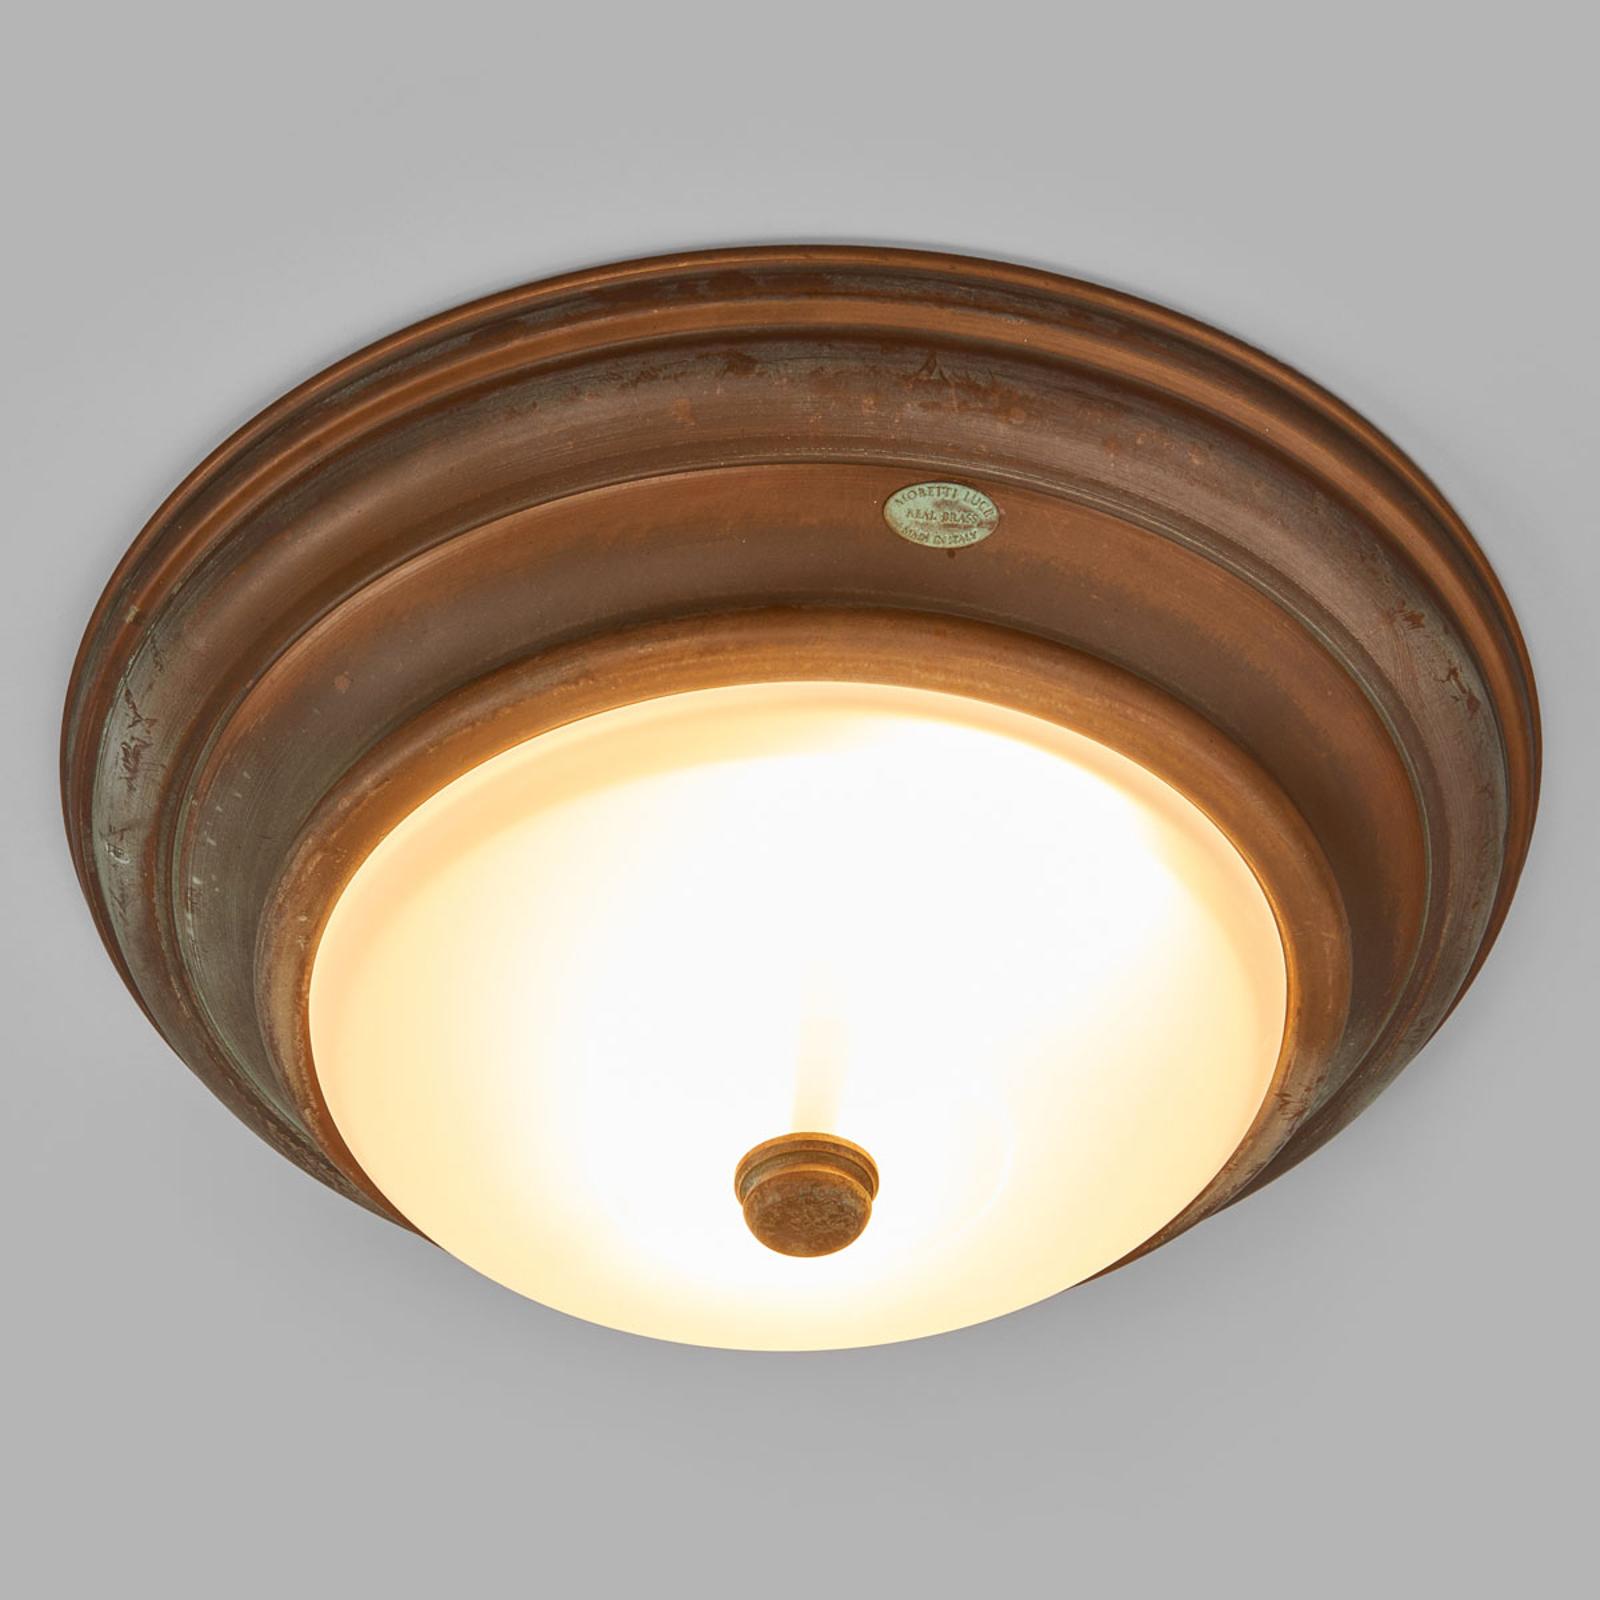 Stylizowana na antyk lampa sufitowa Clasico